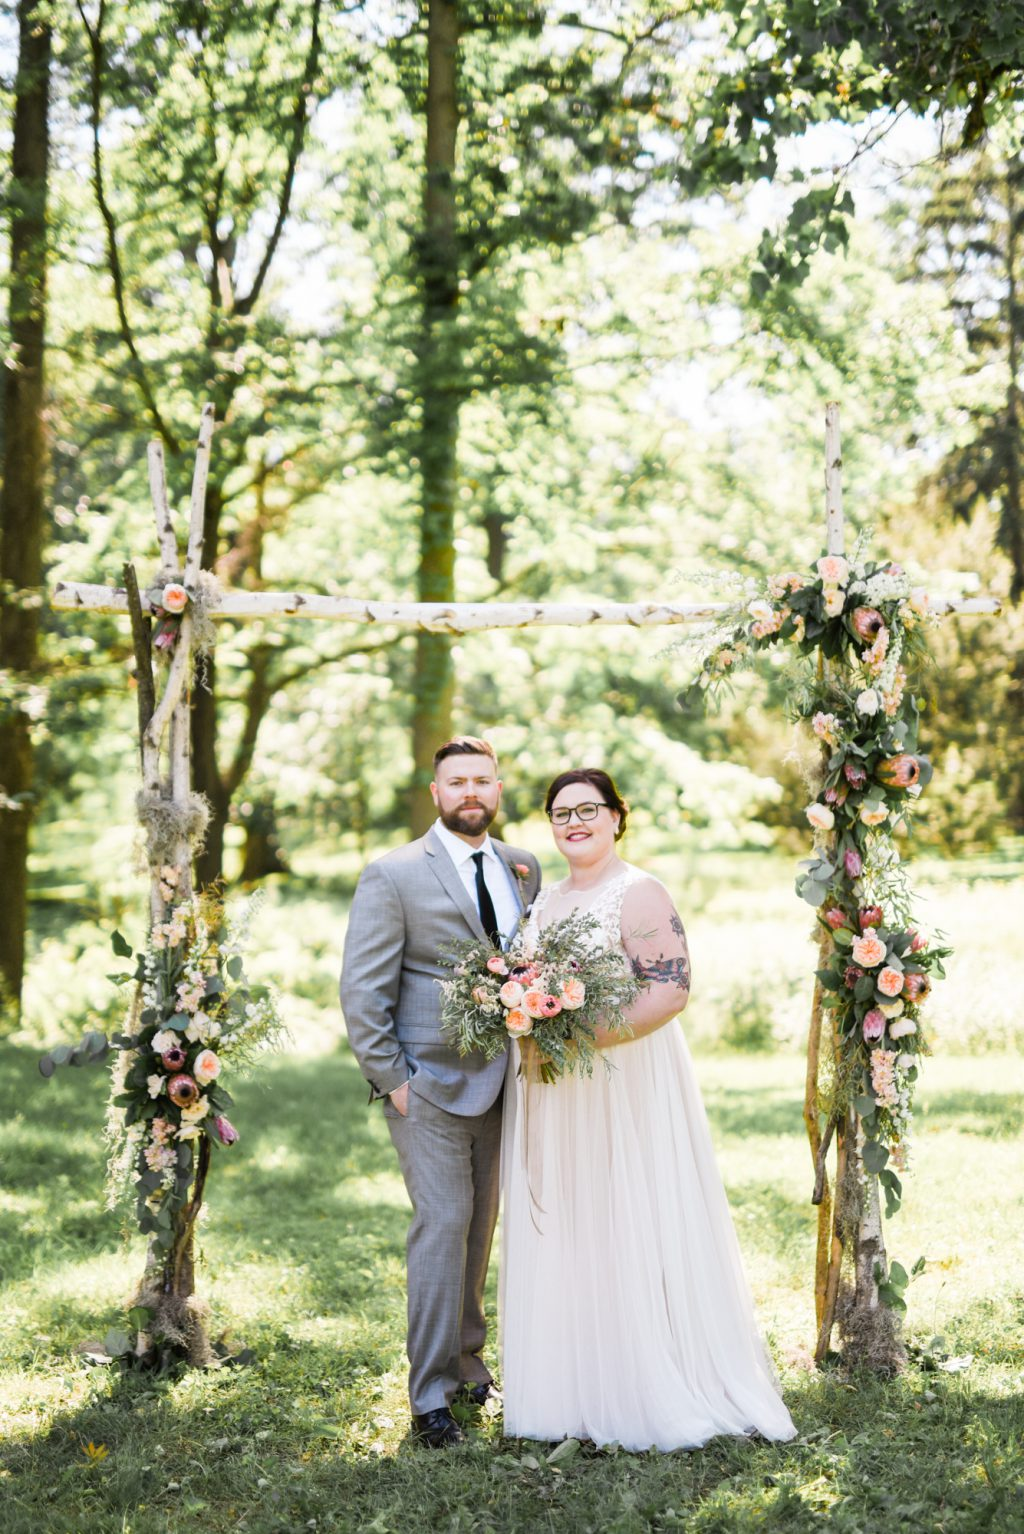 haley-richter-photo-west-chester-summer-wedding-boxcar-brewery-101